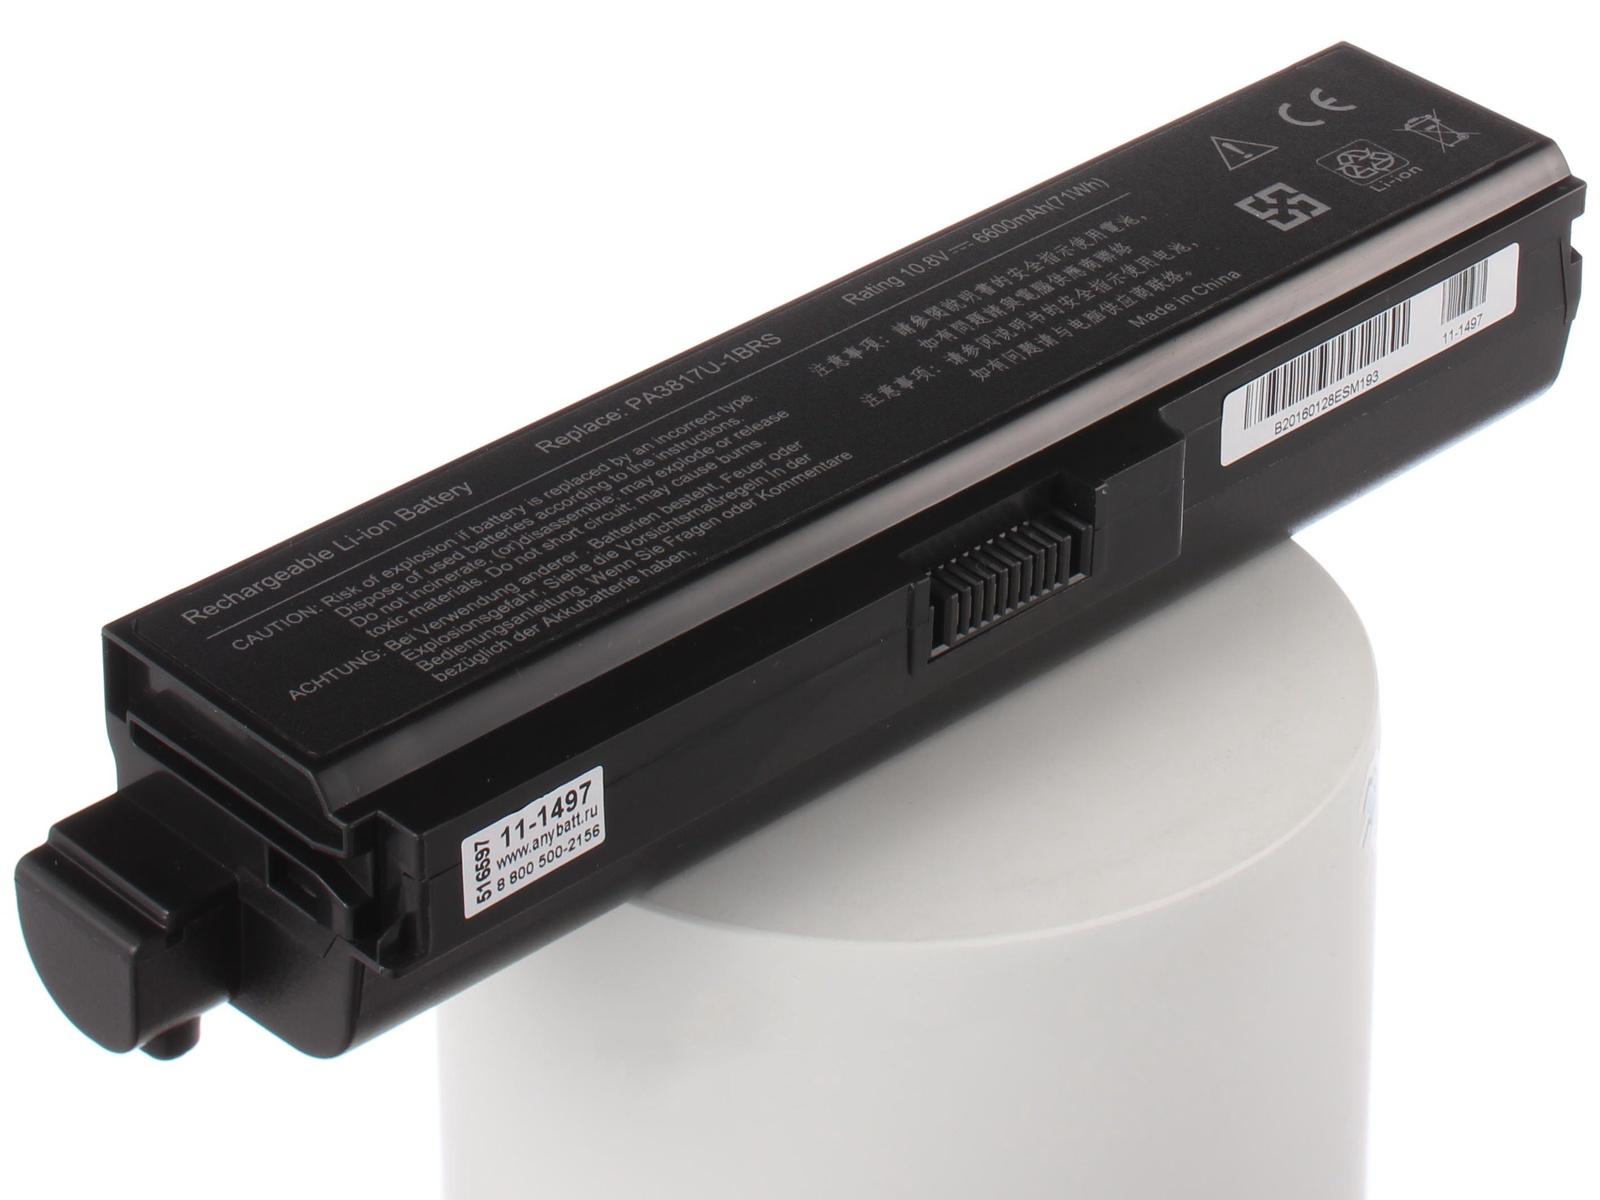 Аккумулятор для ноутбука AnyBatt для ToshiBa Satellite L655-19D, Satellite L675-110, Satellite L675D-113, Satellite L655-19H, Satellite L650D-157, Satellite L655-1CW, Satellite A660-1EN, Satellite L635-10L, Satellite A660-156